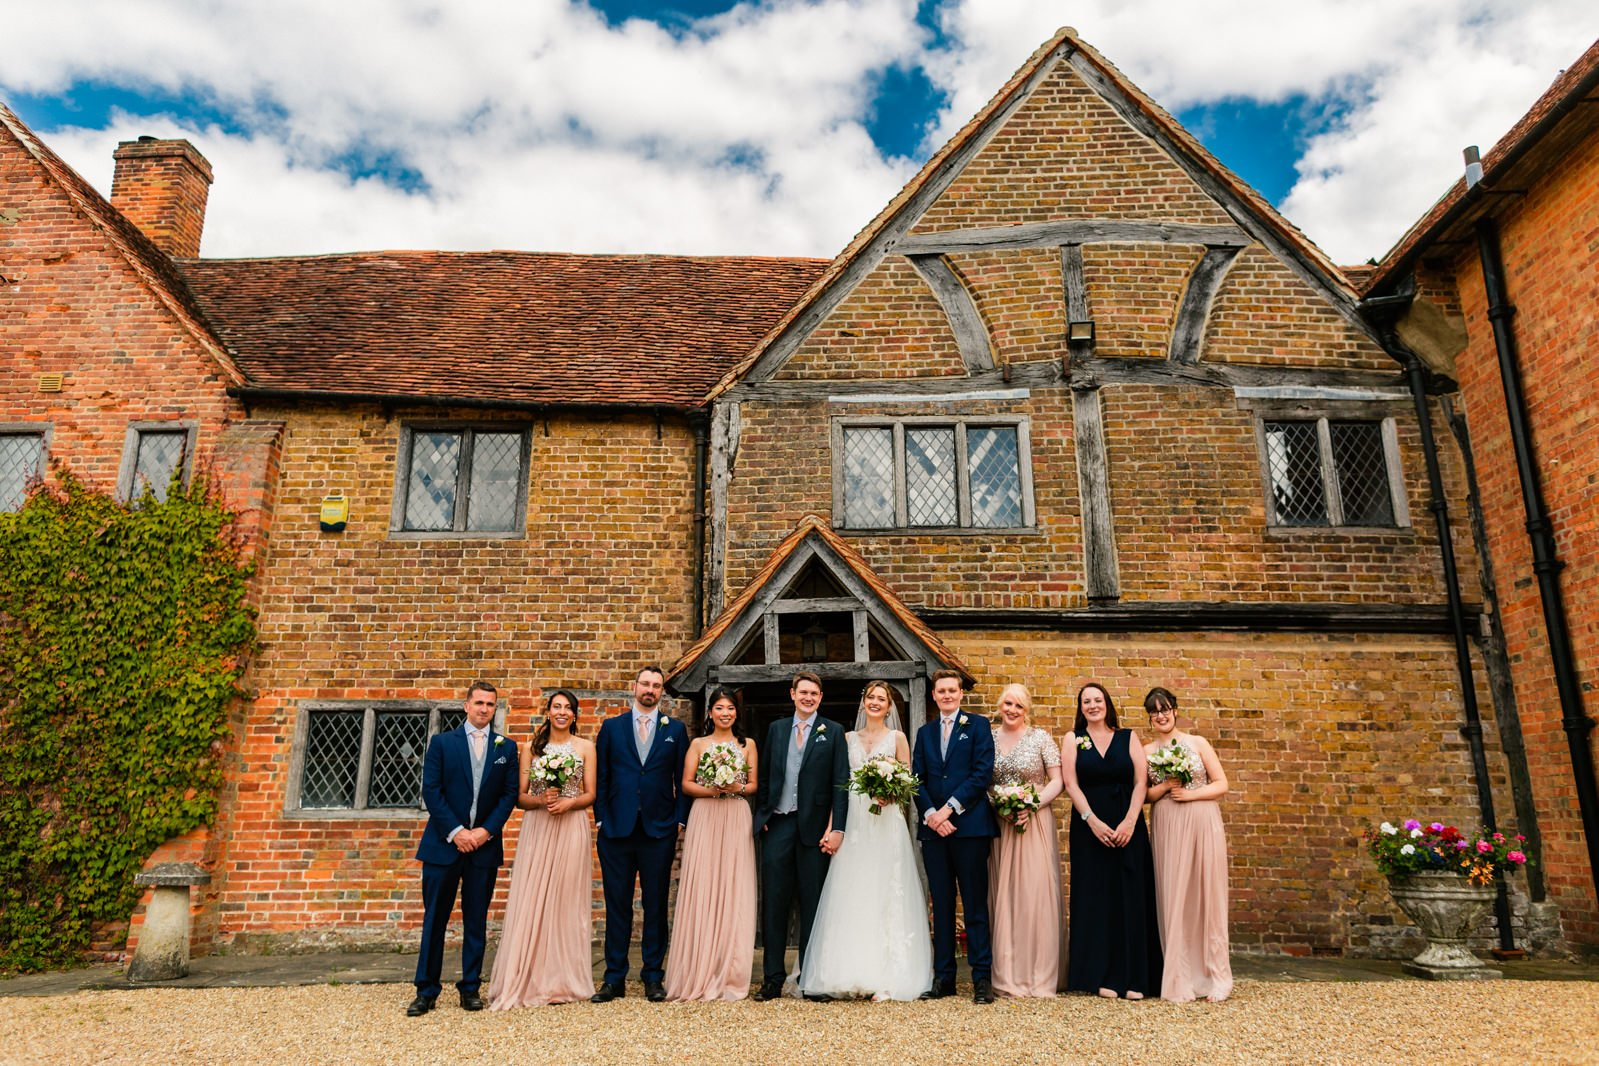 Beautiful Lillibrooke Manor Wedding - Ksenia & Iain 114